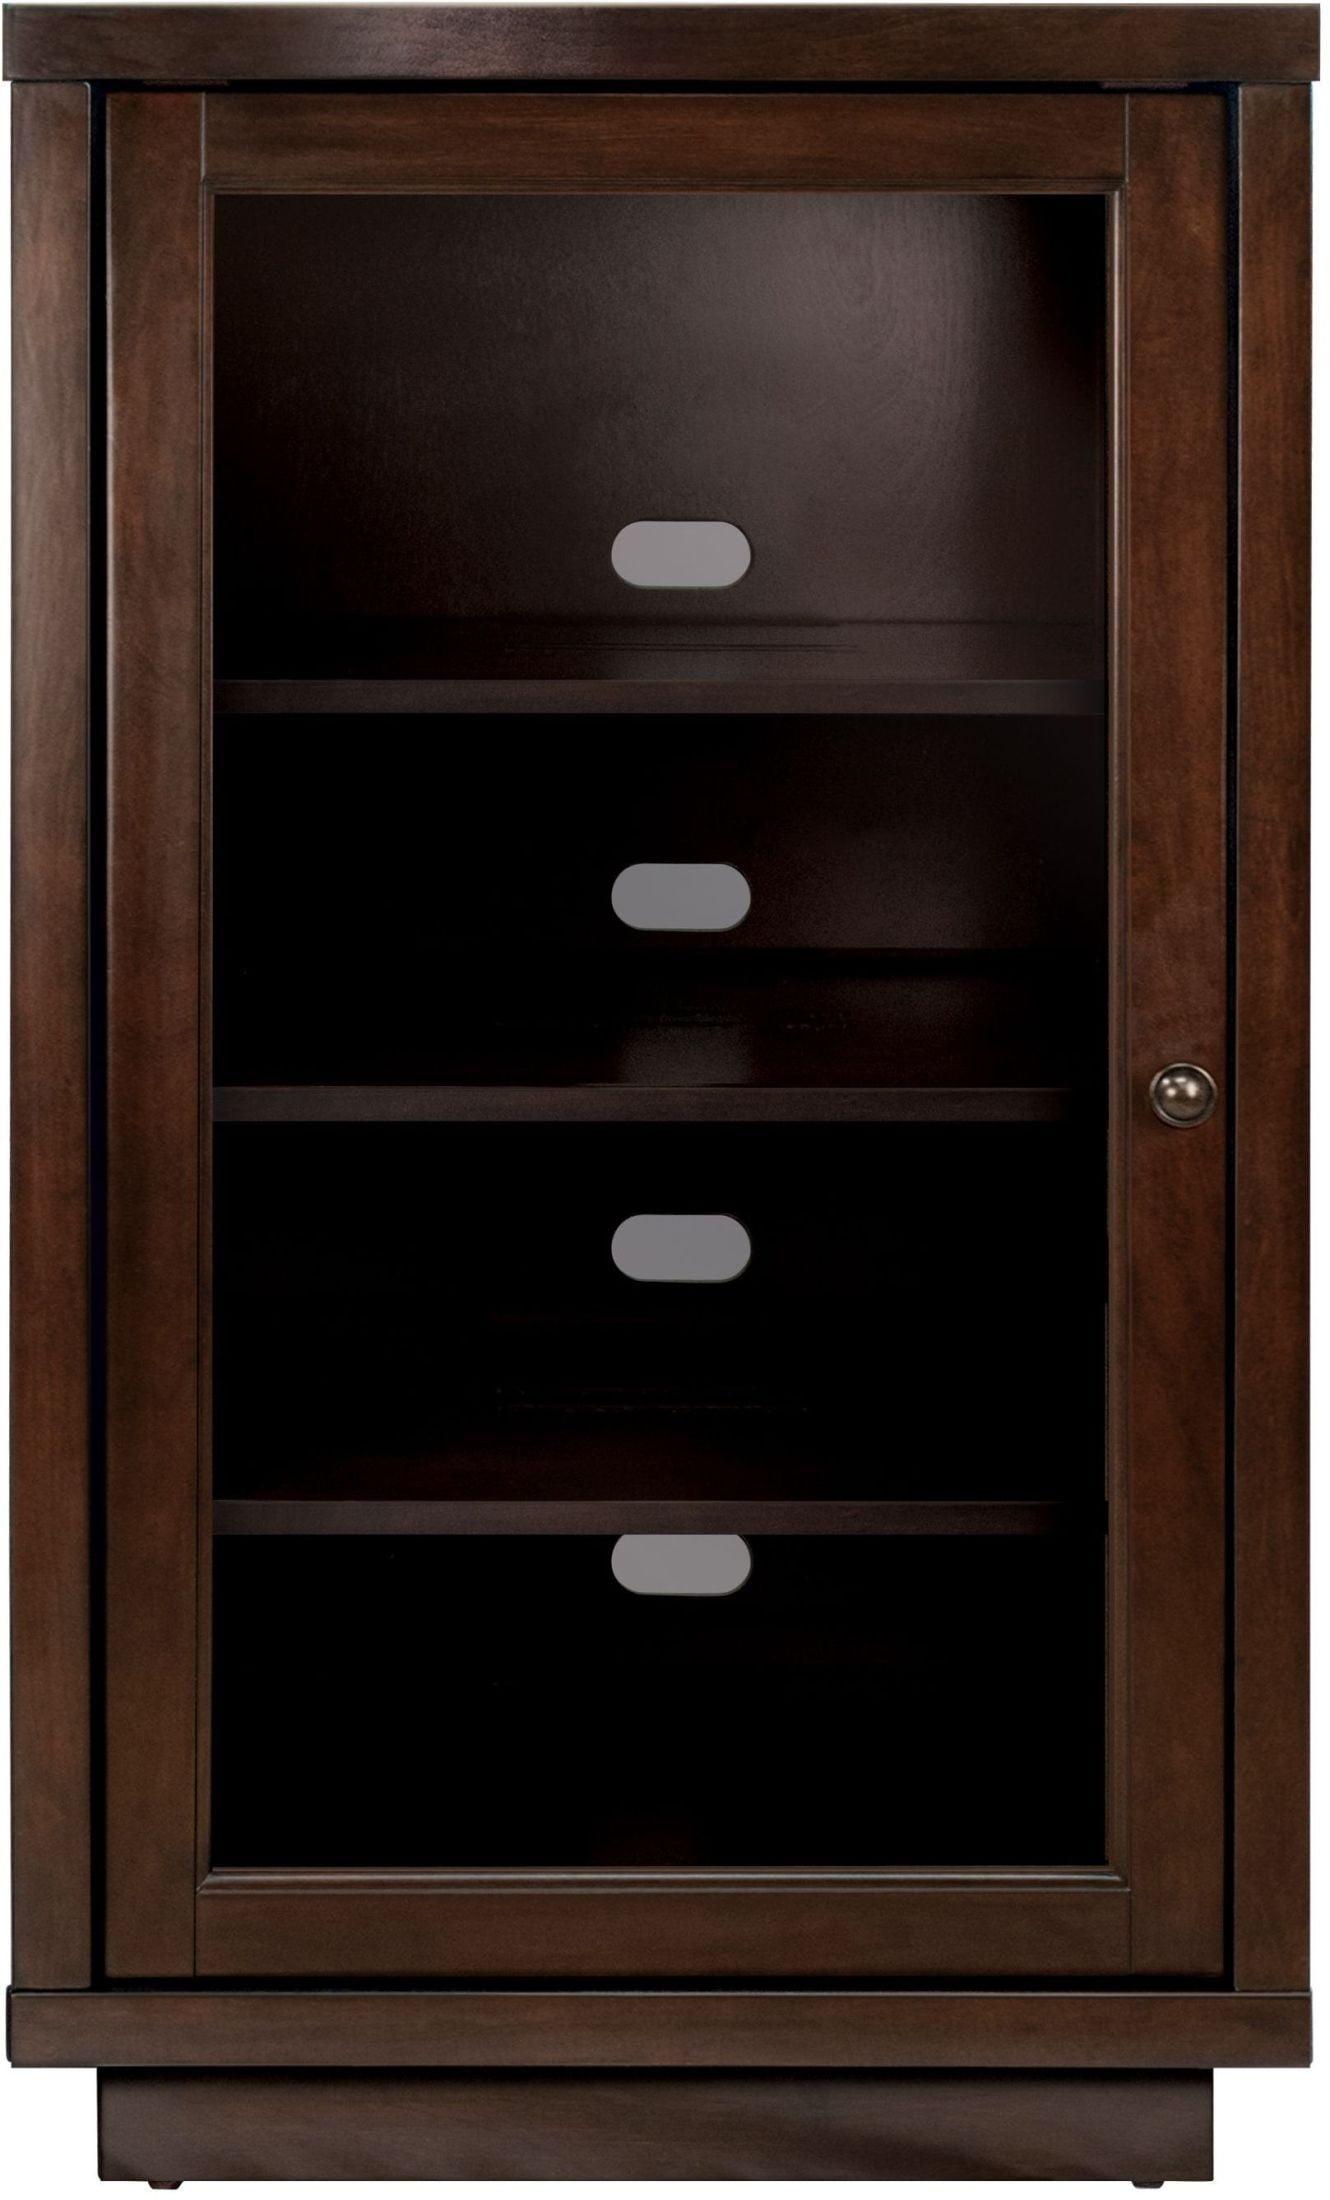 Bellu0027O Dark Espresso Audio Video Component Cabinet From Twin Star  International | Coleman Furniture